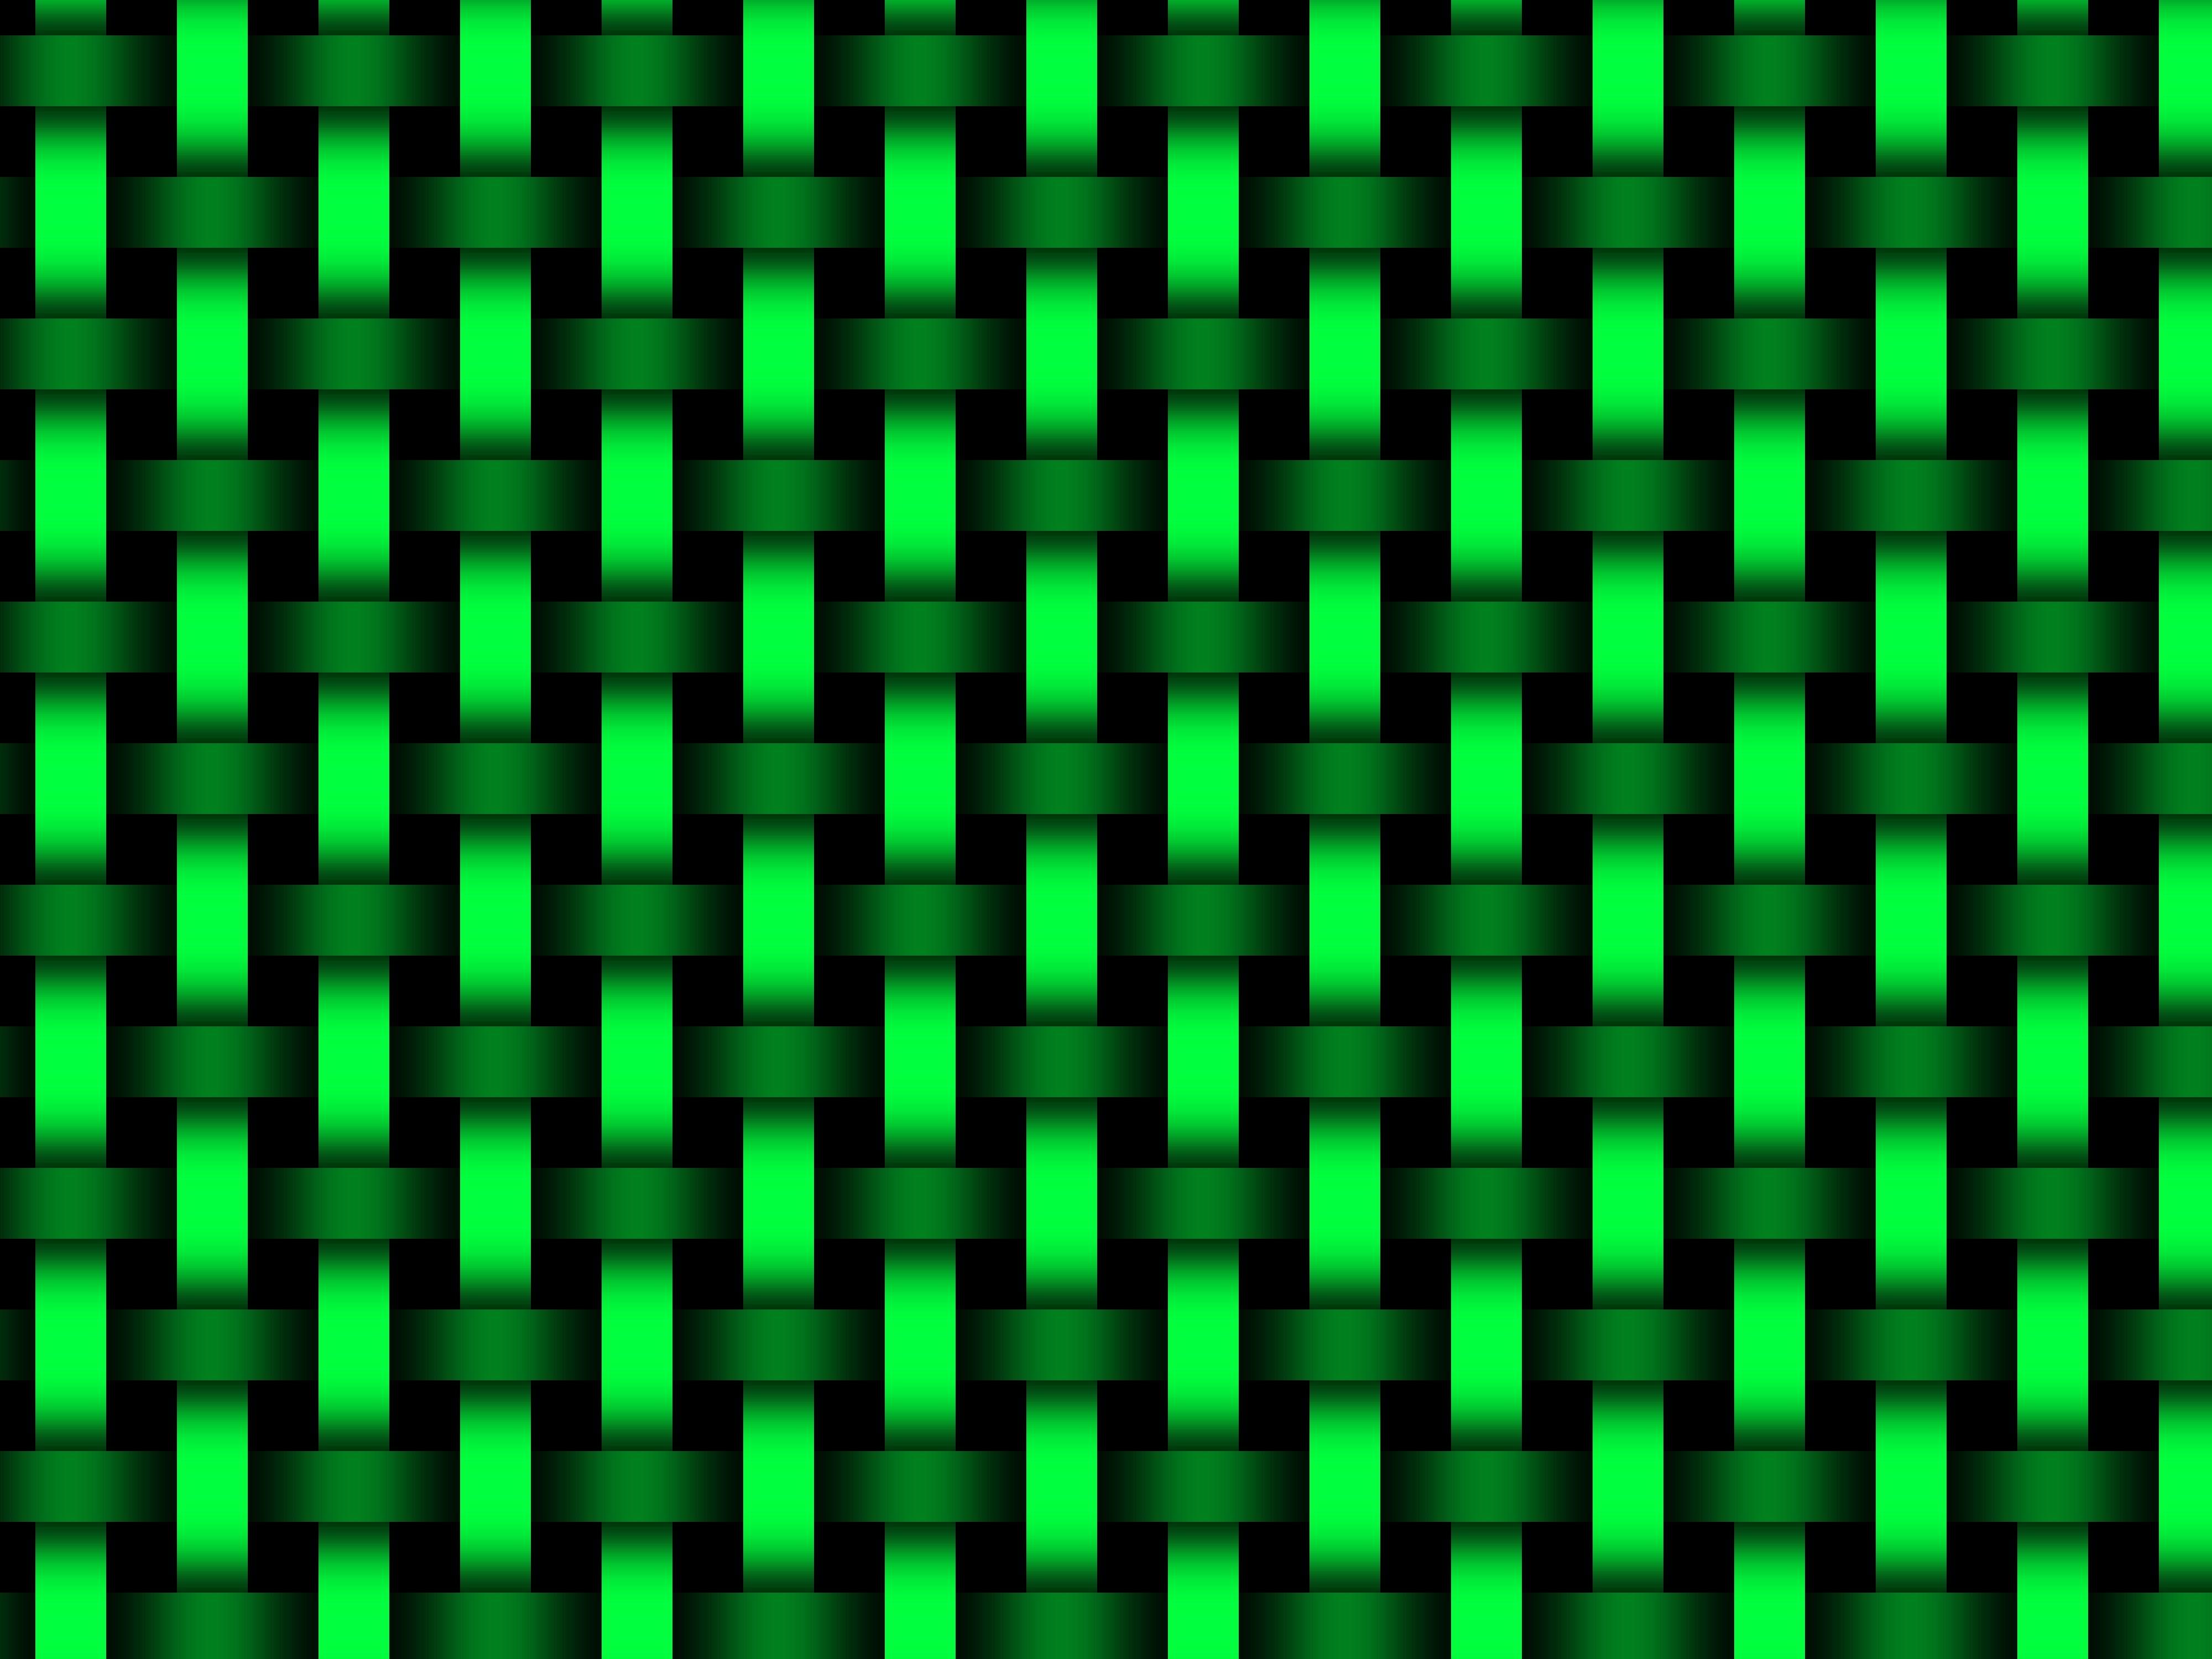 4000x3000 HQ Definition Wallpaper Desktop pattern | 50 shades of ...